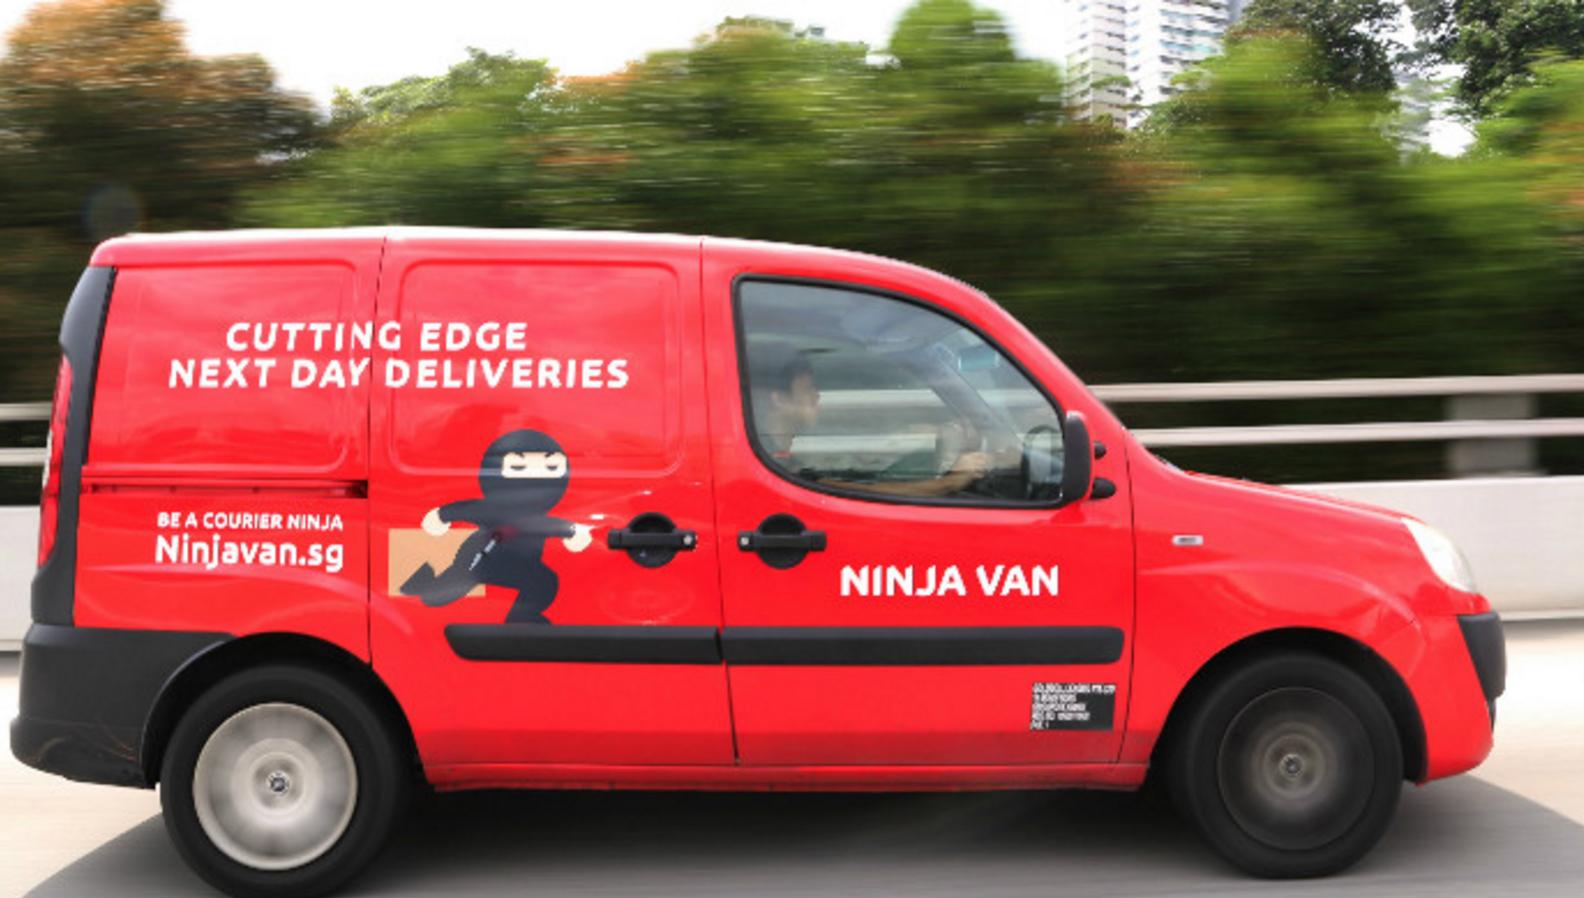 Photo credit: Ninja Van